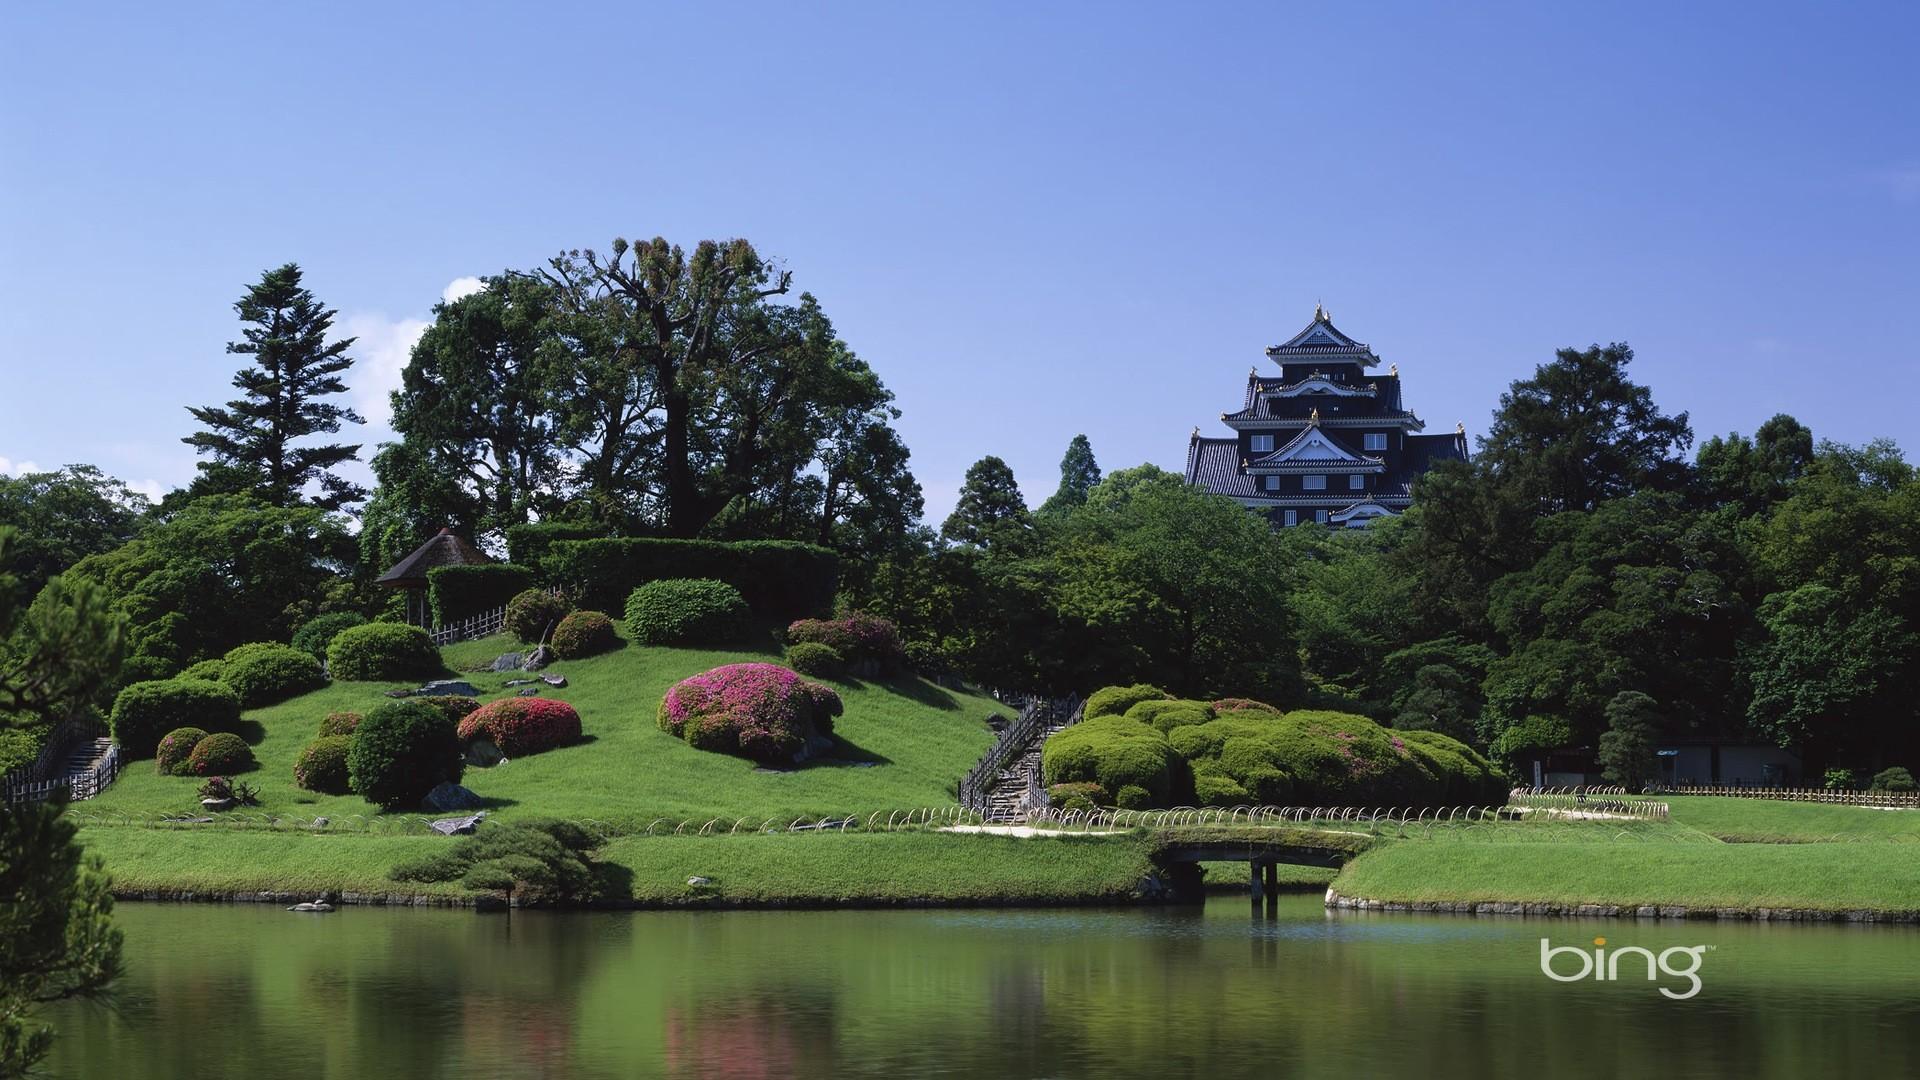 Microsoft Bing HD Wallpapers: Japanese landscape theme wallpaper #15 –  1920×1080.